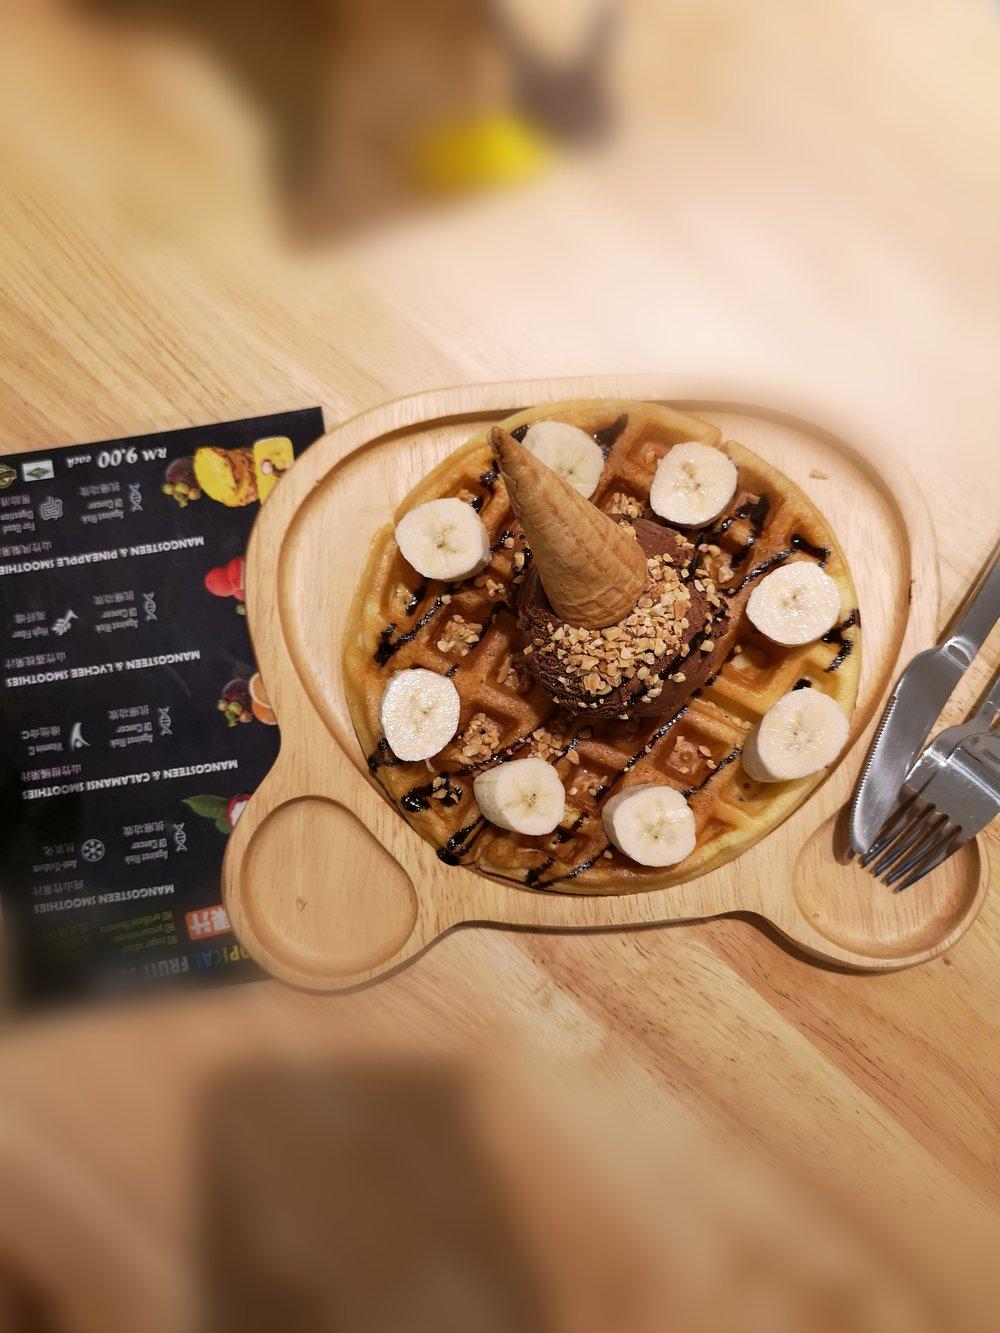 Jojo Ice Cream Bukit Indah Waffle with Ice Cream (RM19)